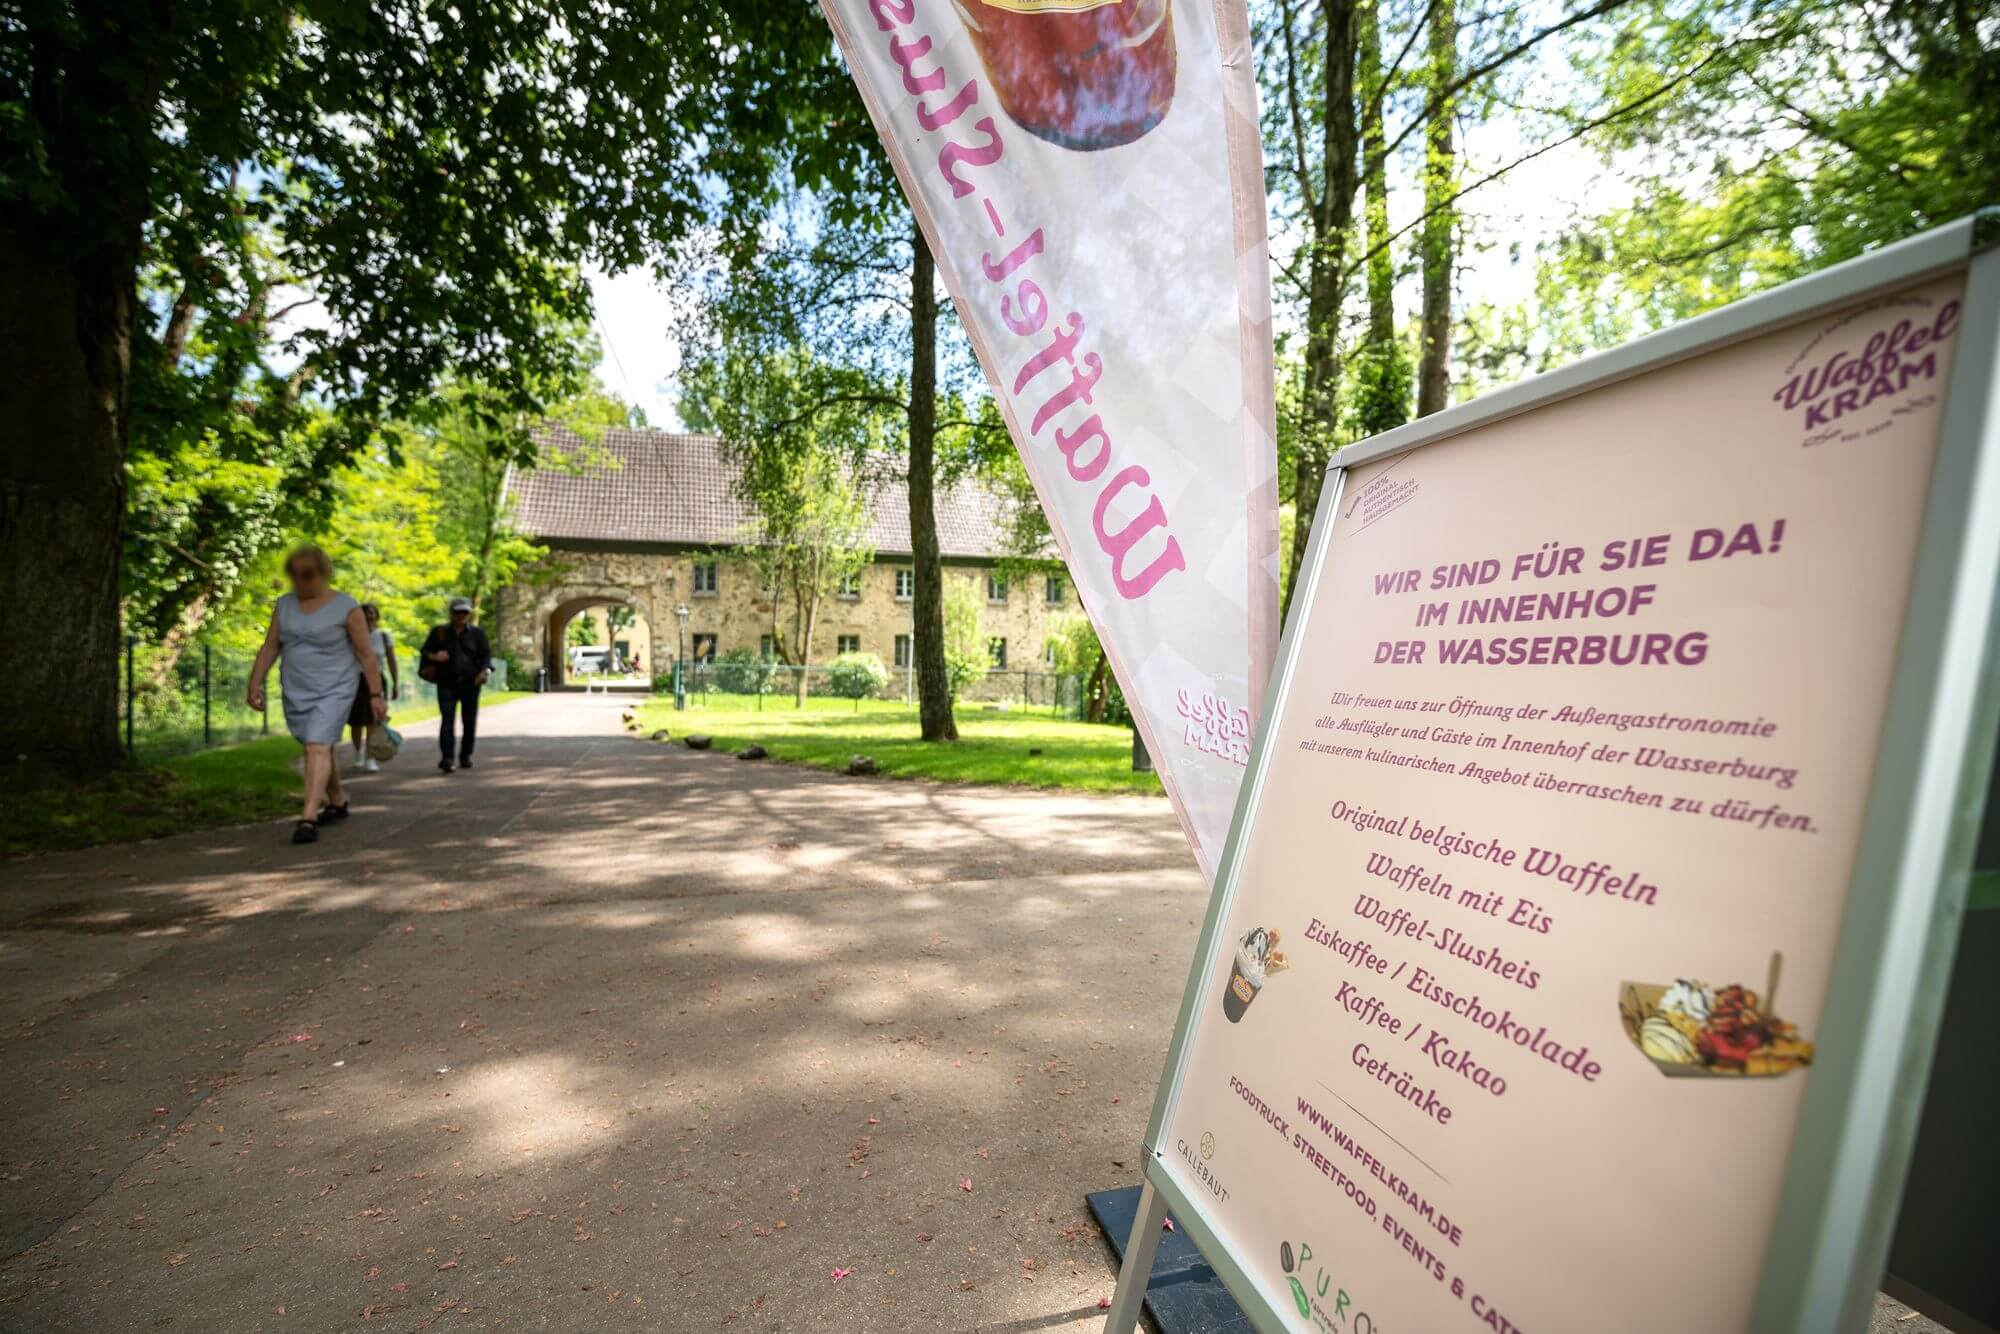 konzert-catering-wasserburg-langenfeld-wk3